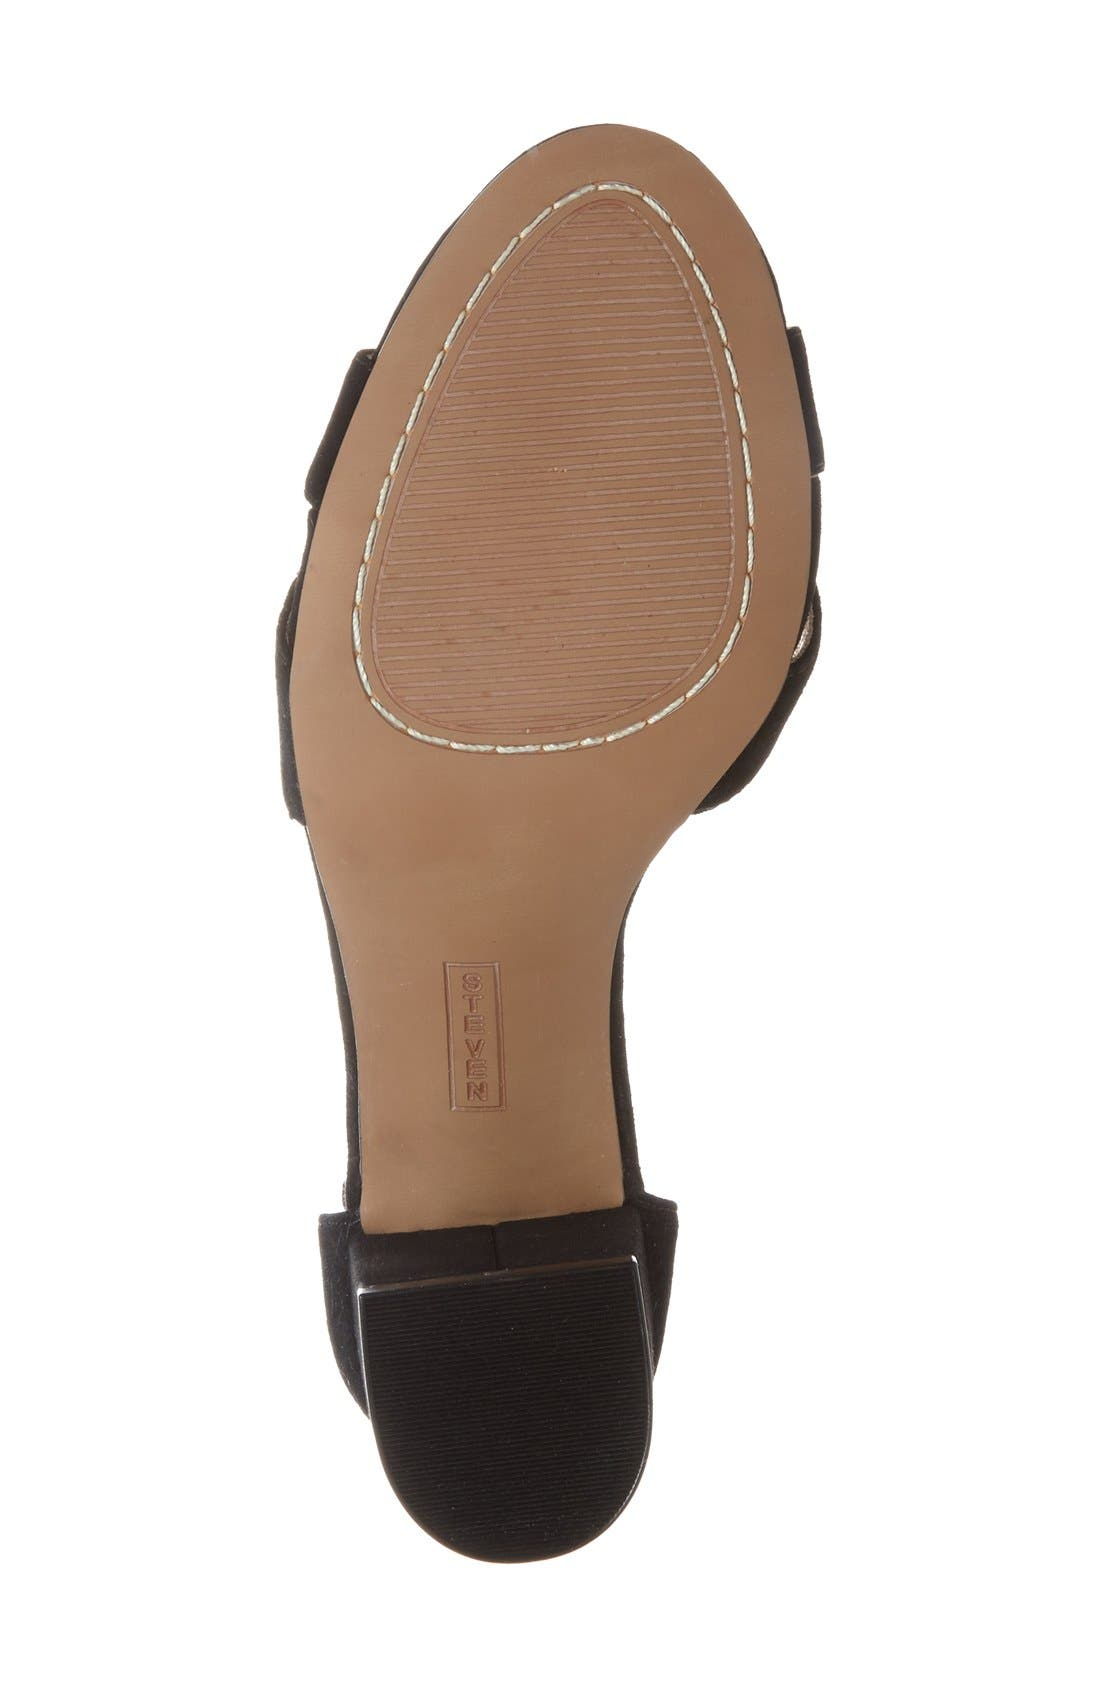 'Voomme' Ankle Strap Sandal,                             Alternate thumbnail 13, color,